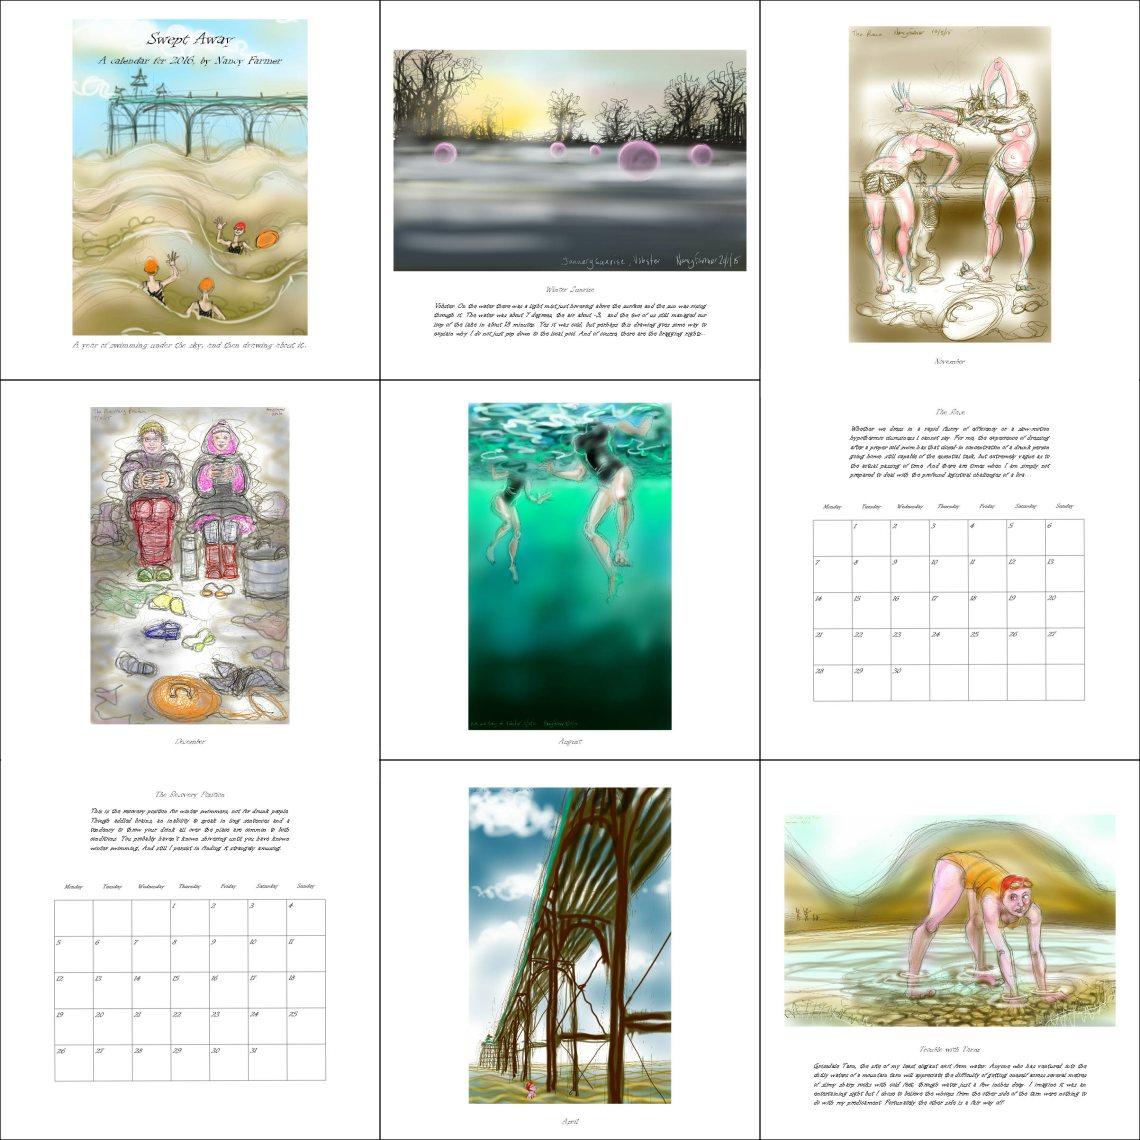 Swept Away - a calendar for 2016 by Nancy Farmer